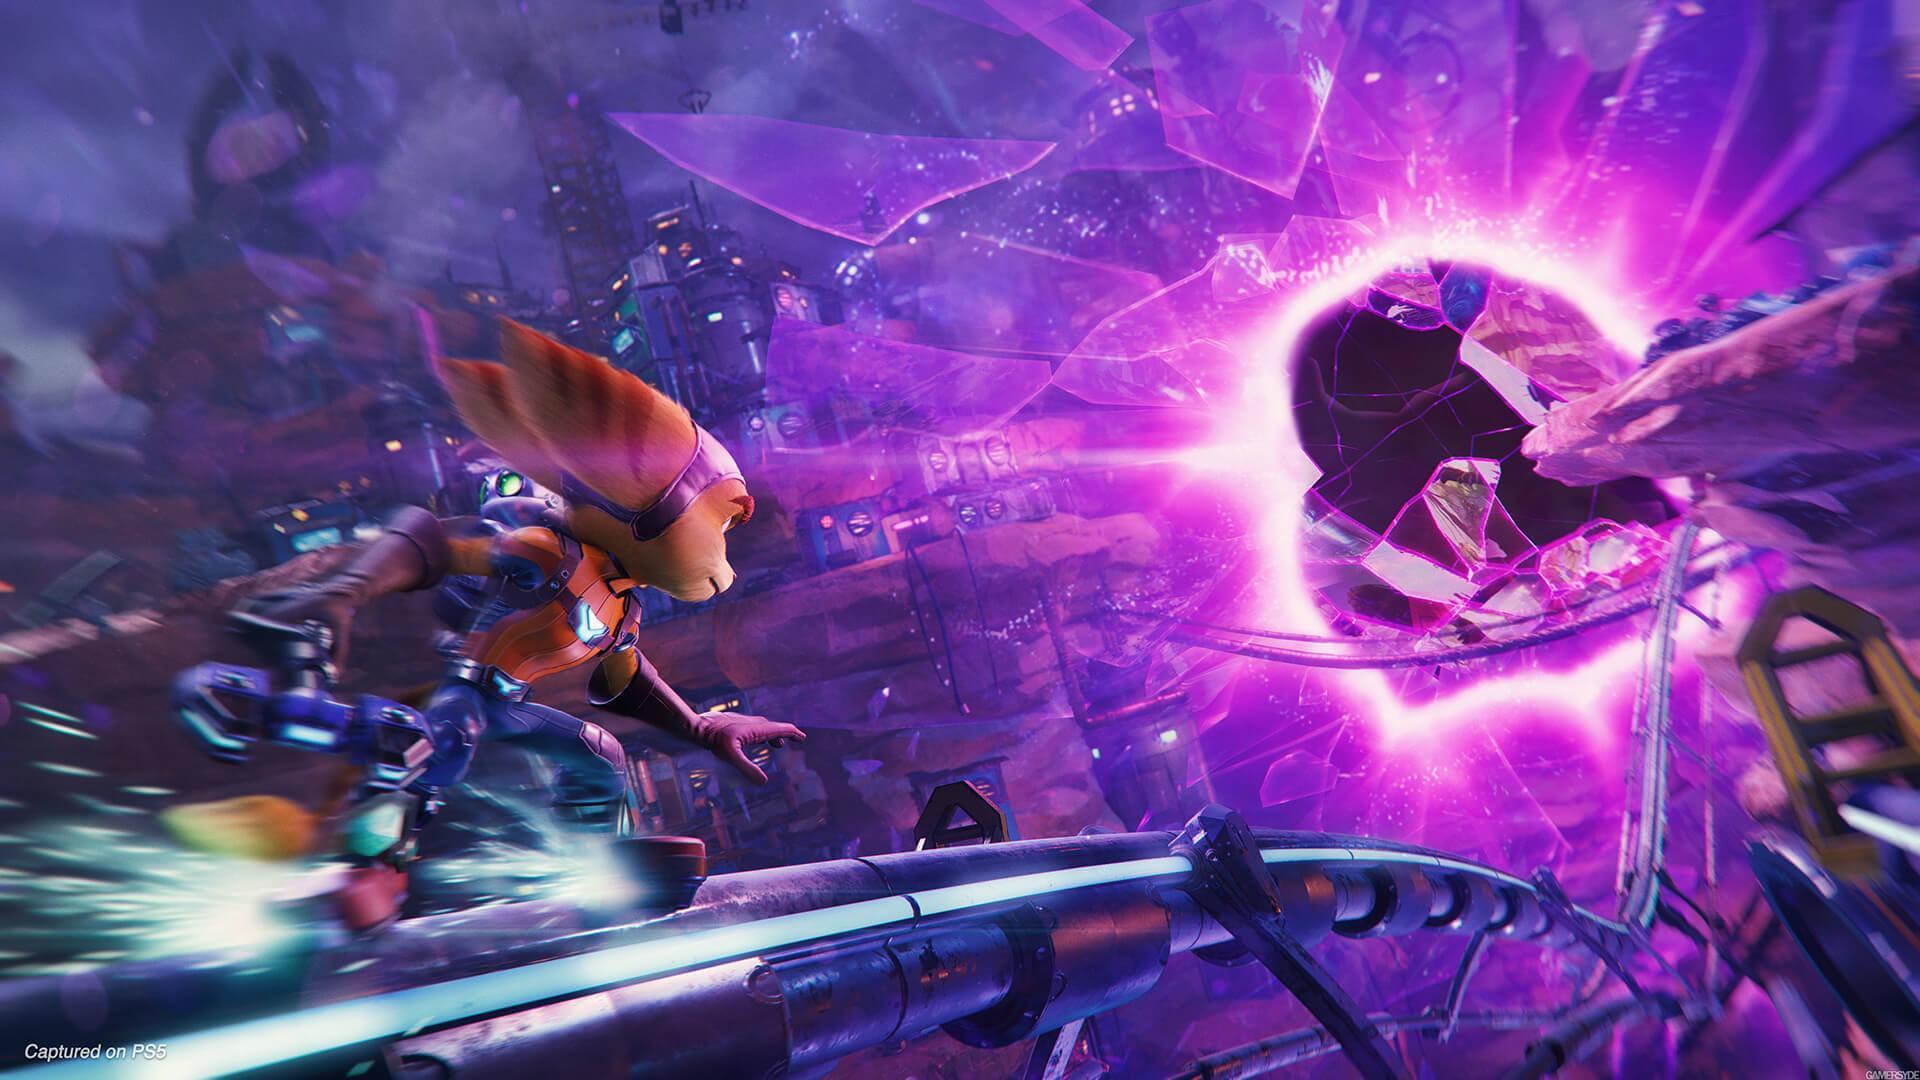 Ratchet & Clank: Rift Apart, Subnautica: Below Zero, Among Us - всё, что показали на прошедшей State of Play 2